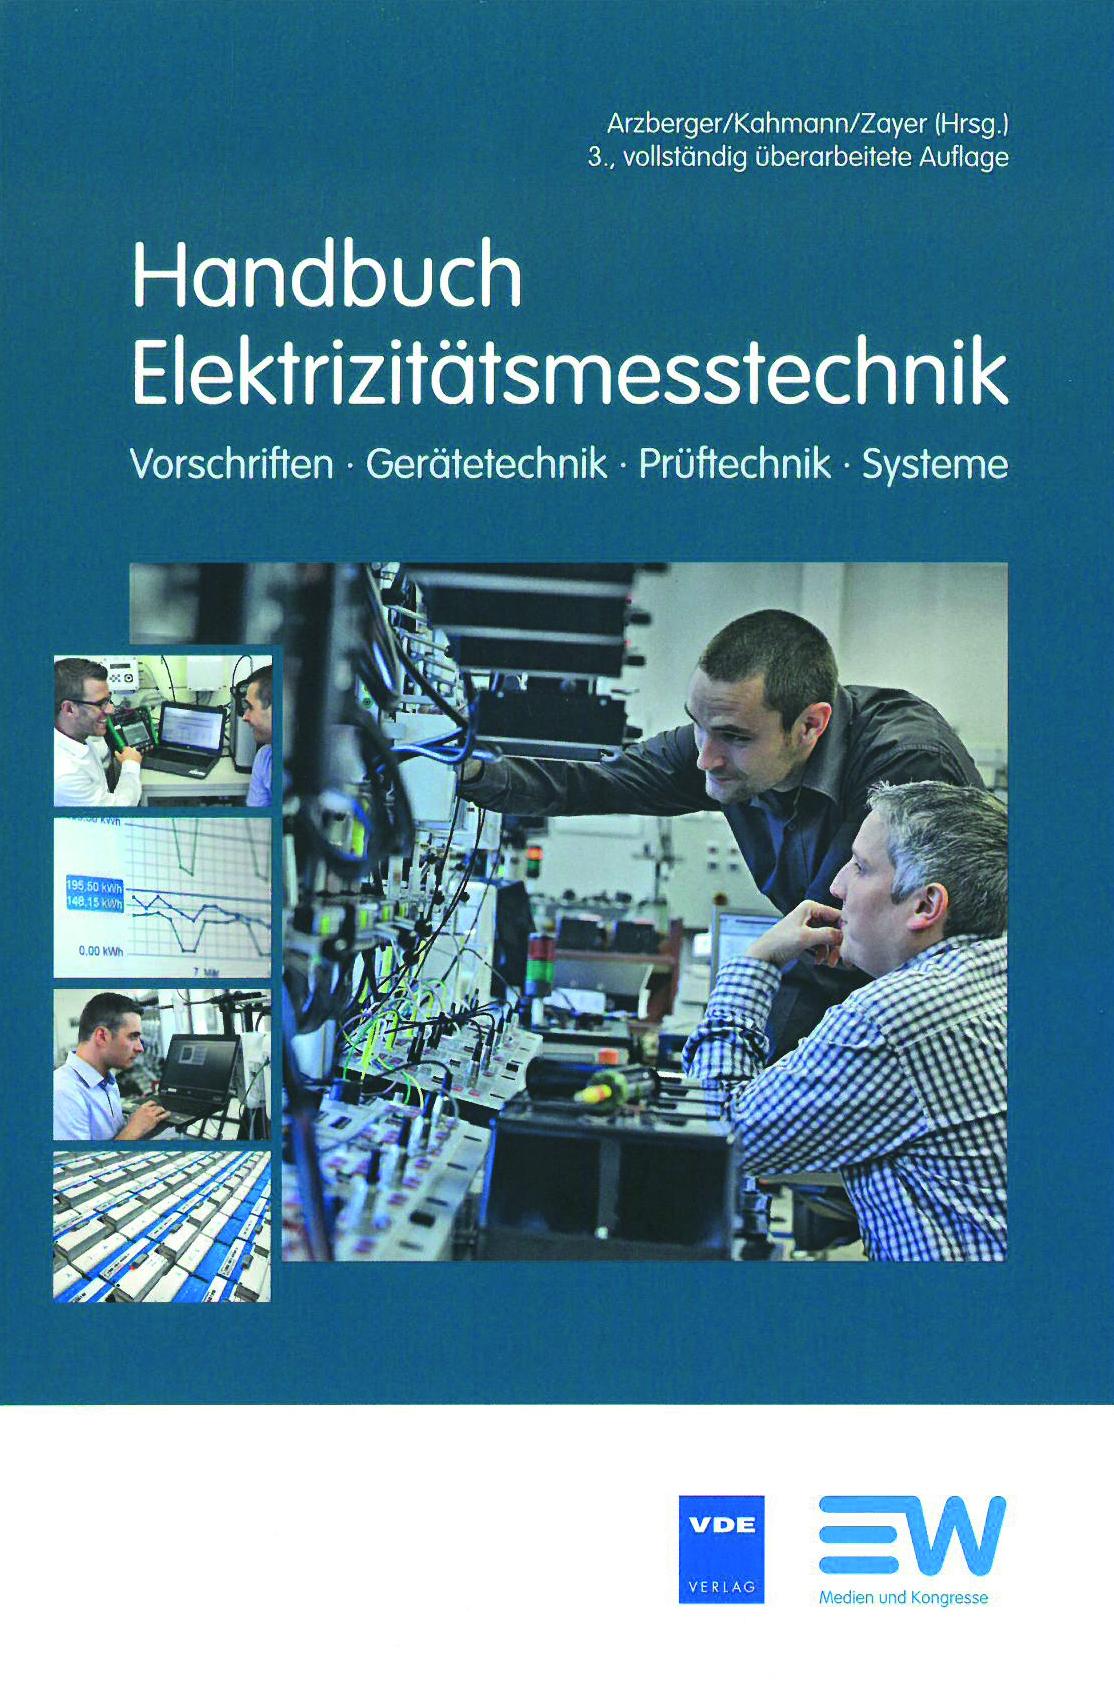 Handbuch Elektrizitätsmesstechnik